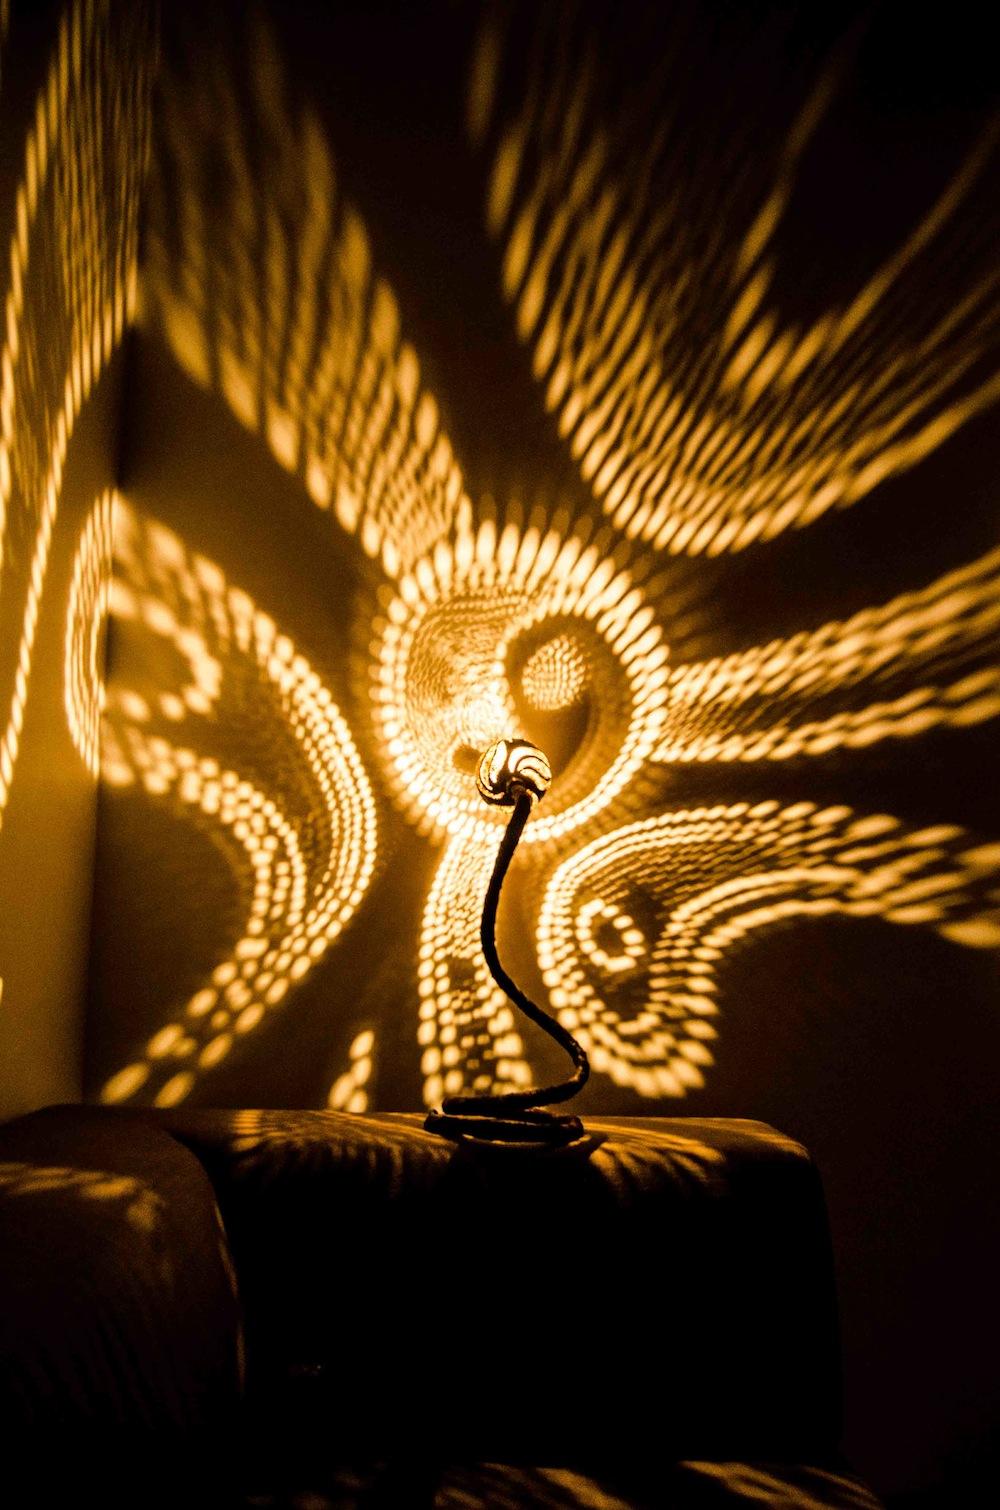 vainius kubilius et ses lampes en noix de coco moving tahiti. Black Bedroom Furniture Sets. Home Design Ideas